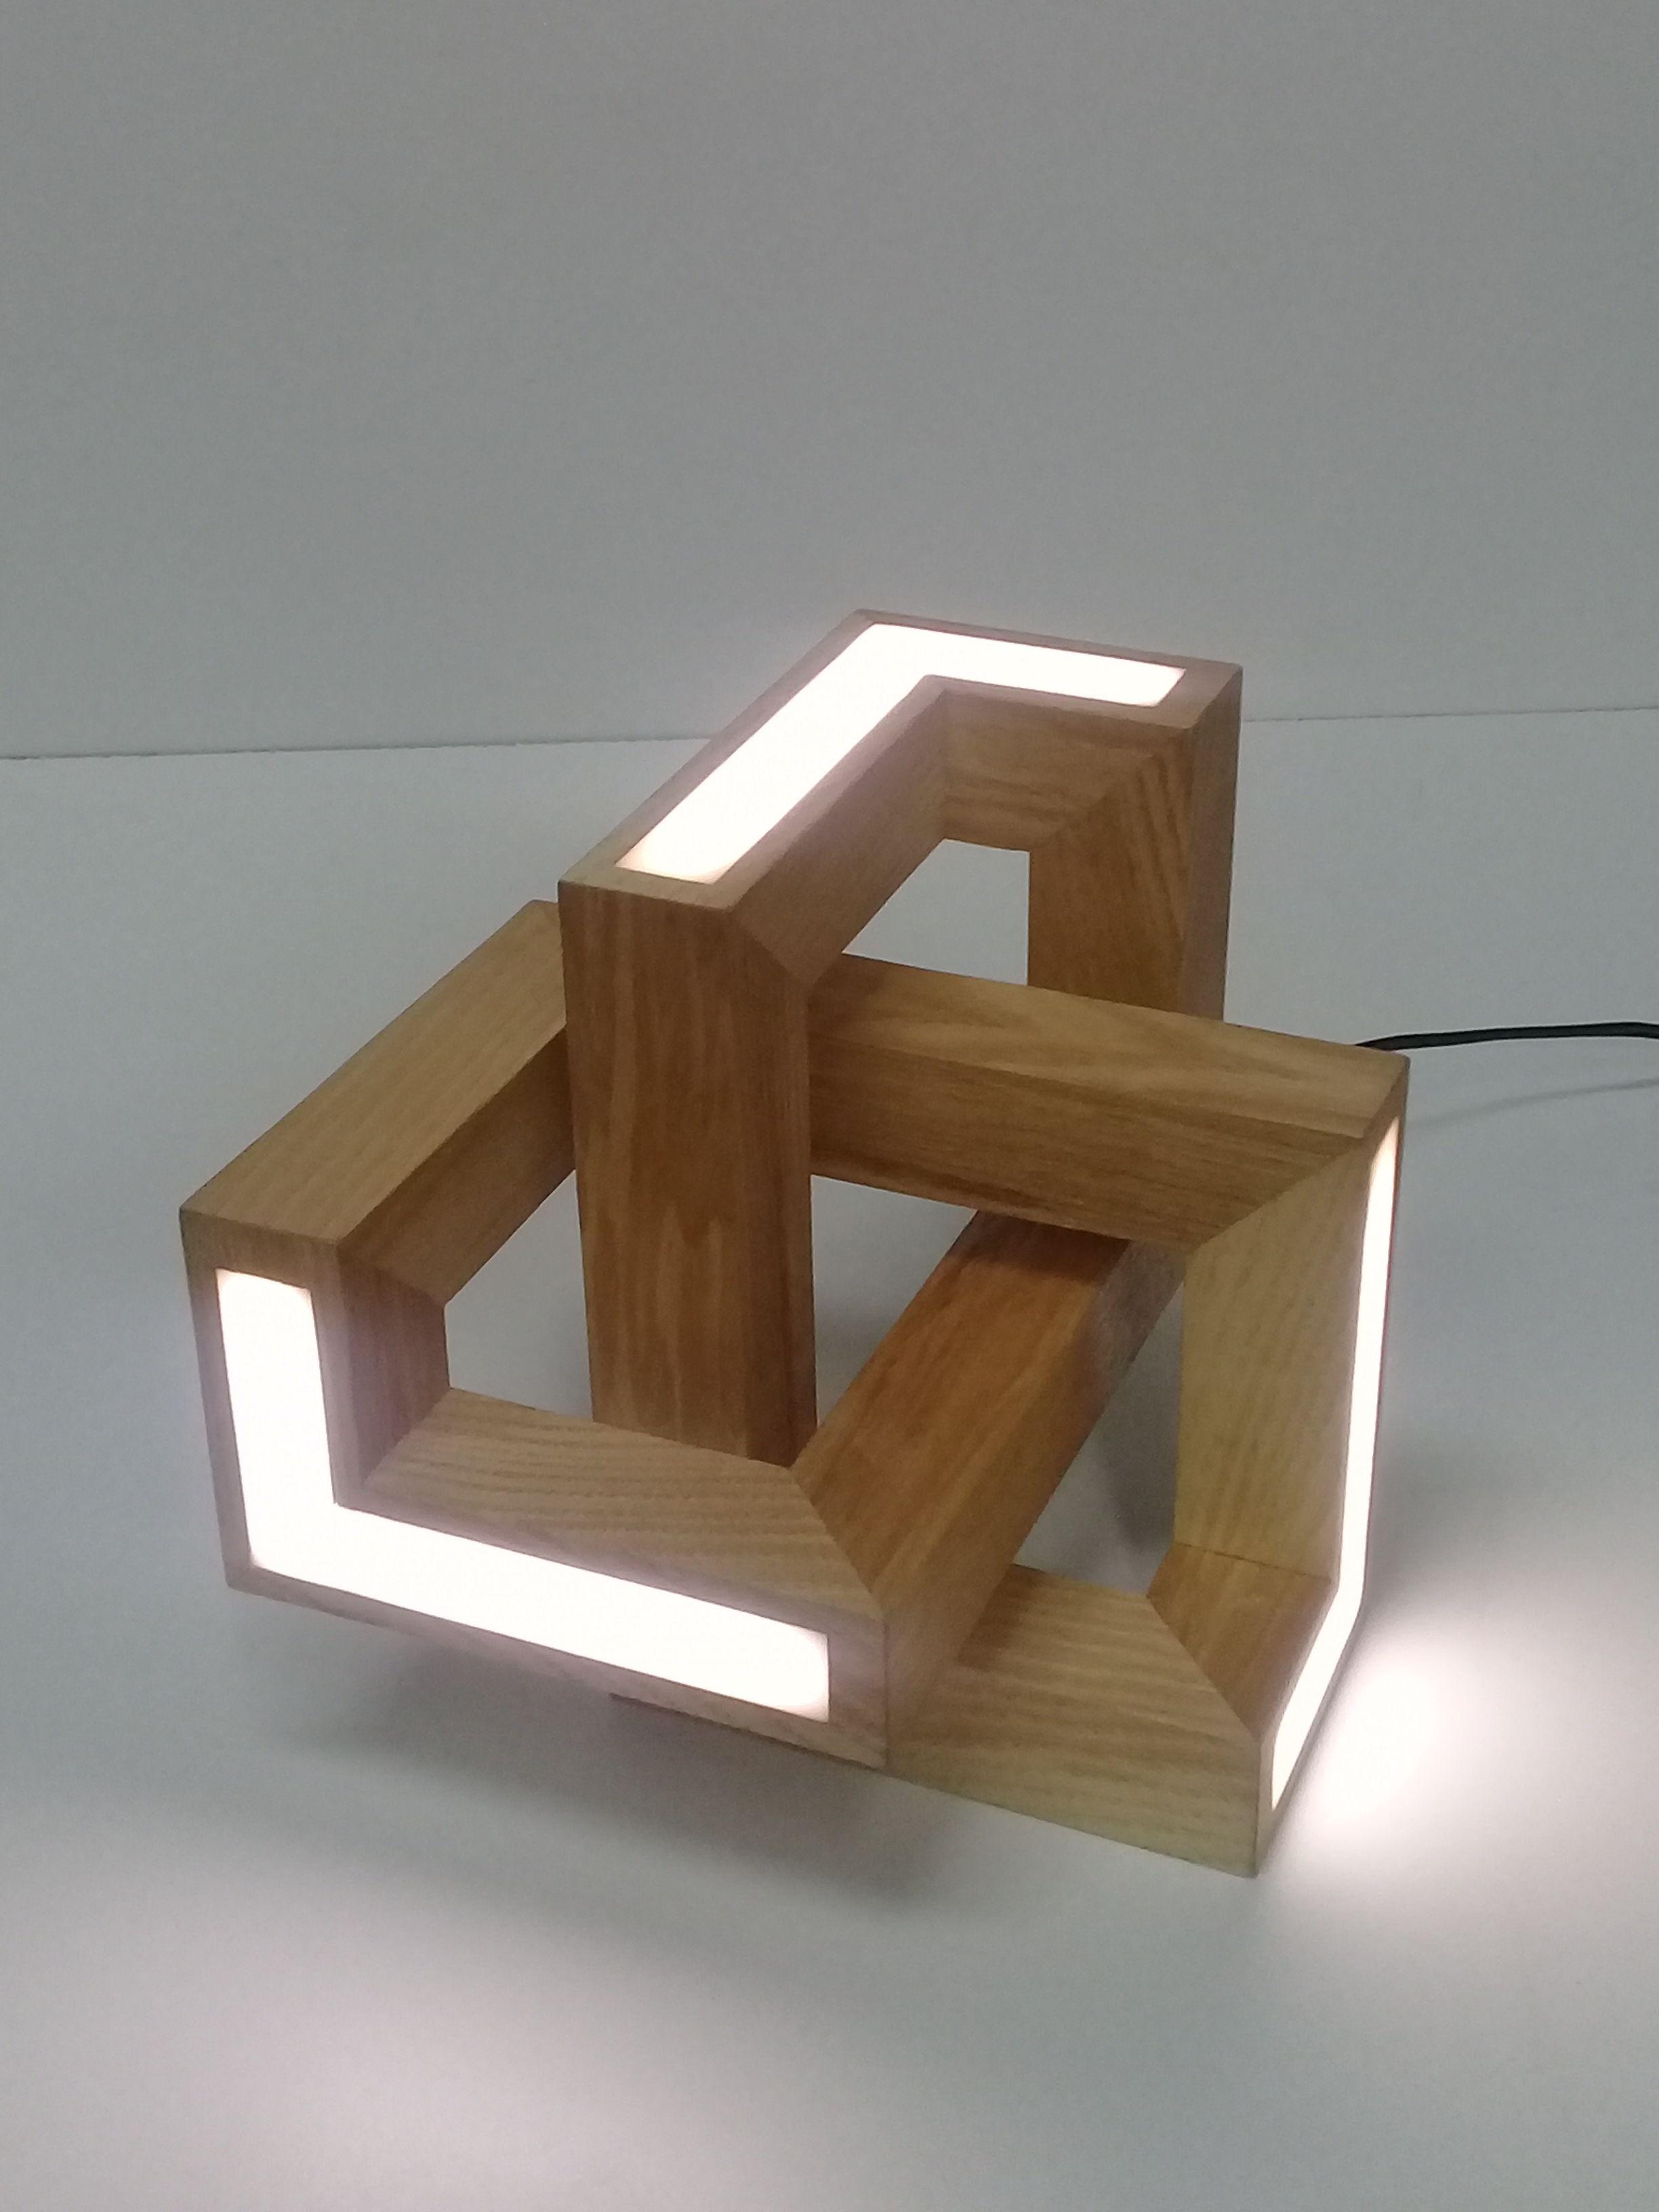 Pin By Stefan Halici On To Do In 2018 Pinterest Lampara Madera - Lampara-de-madera